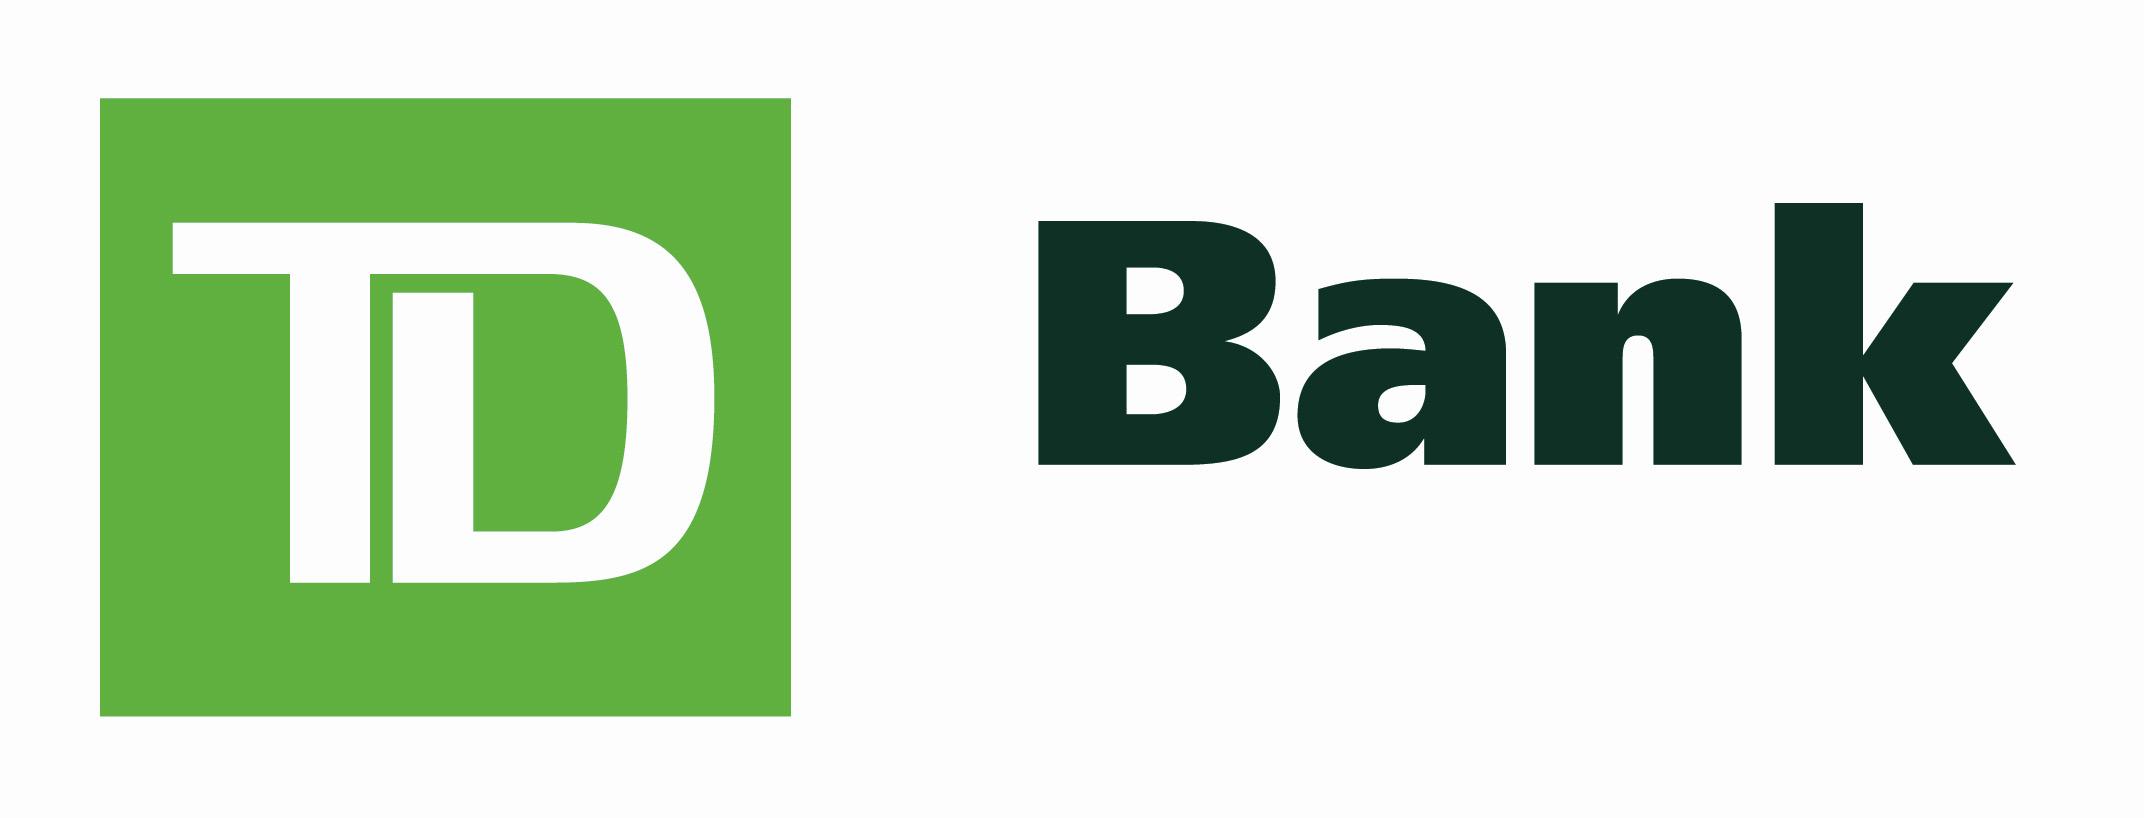 Bank Logo photo - 1